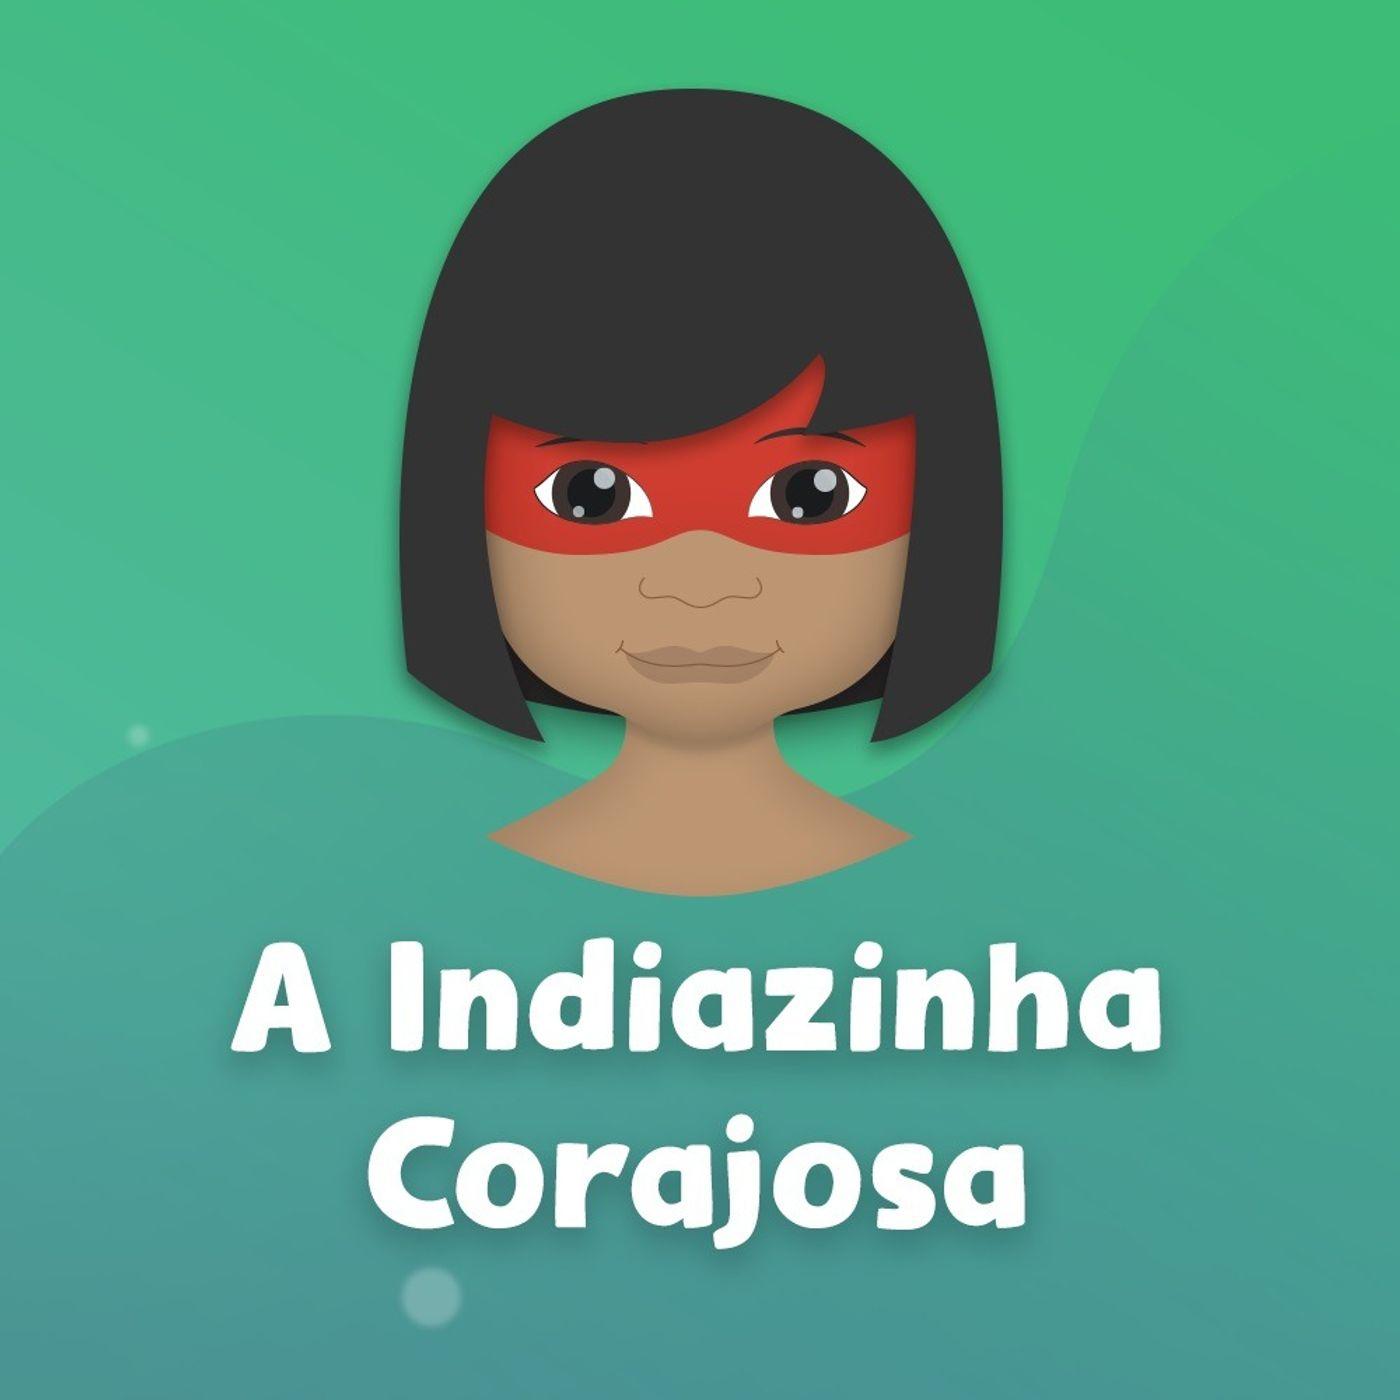 A Indiazinha Corajosa